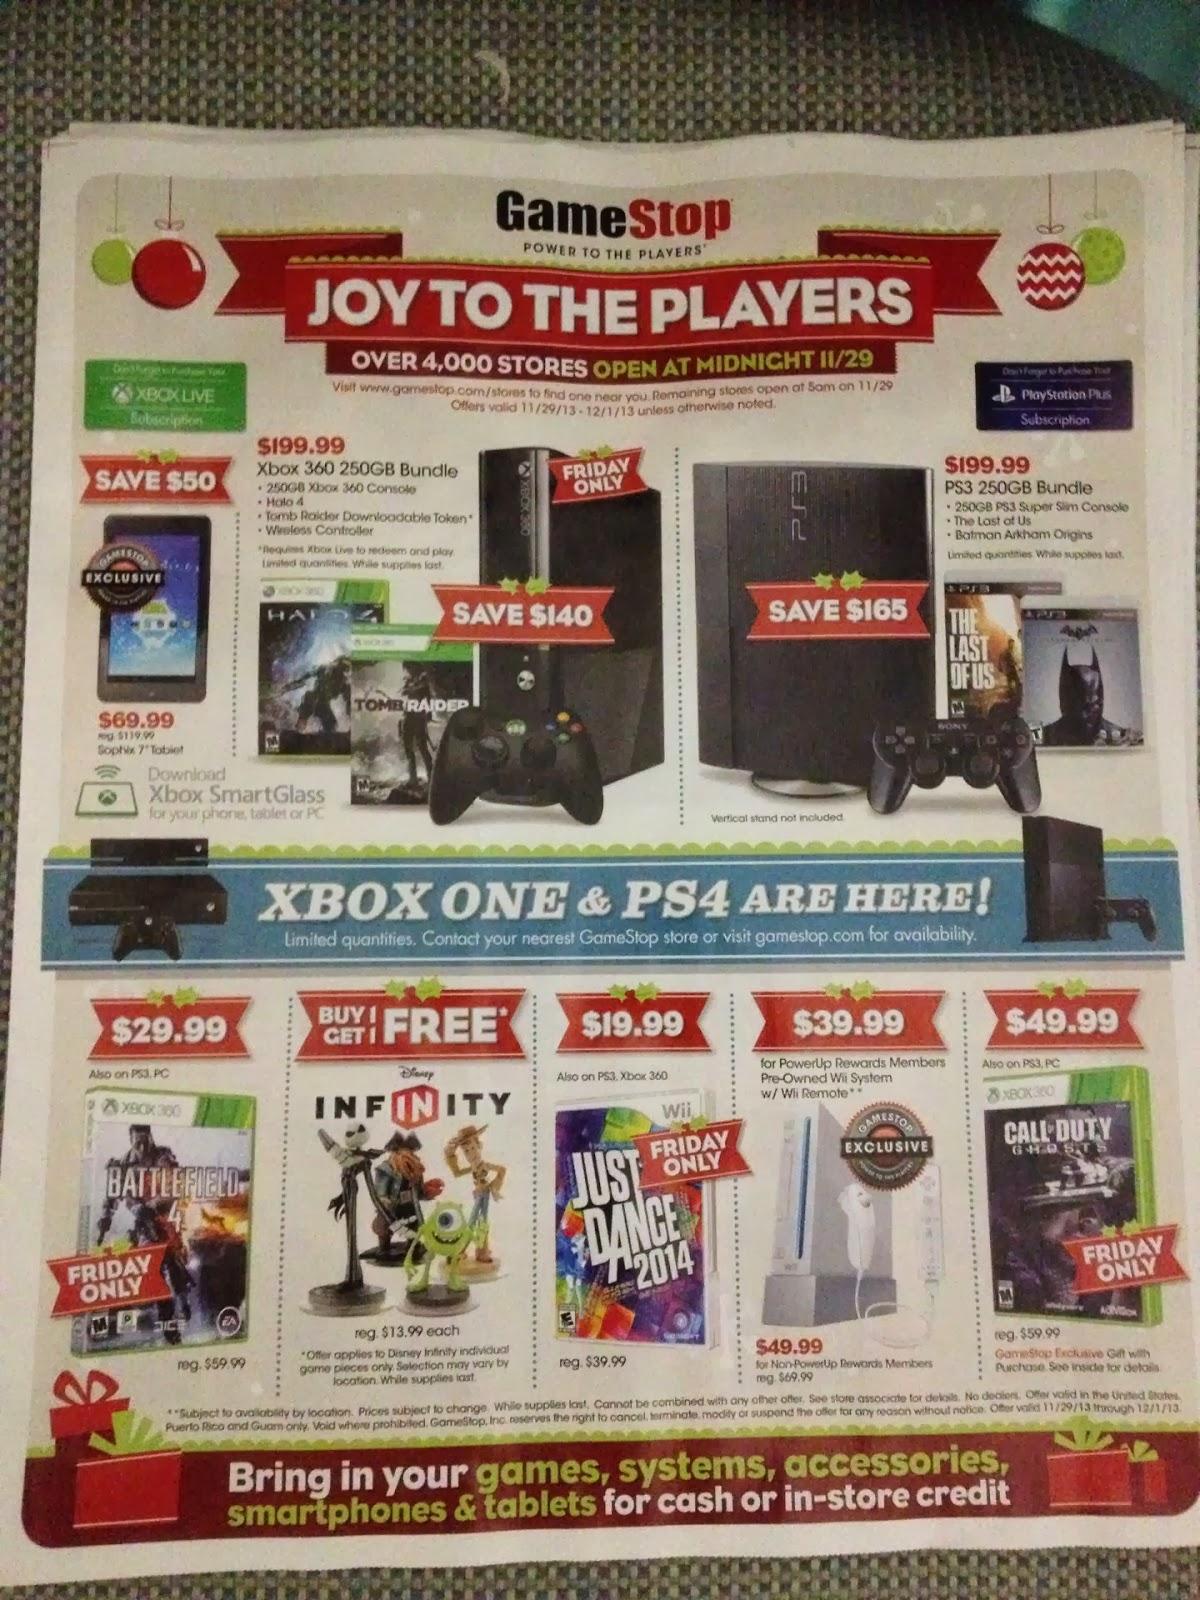 Video Gamer S Tribune Gamestop 2013 Black Friday Deals Leaked